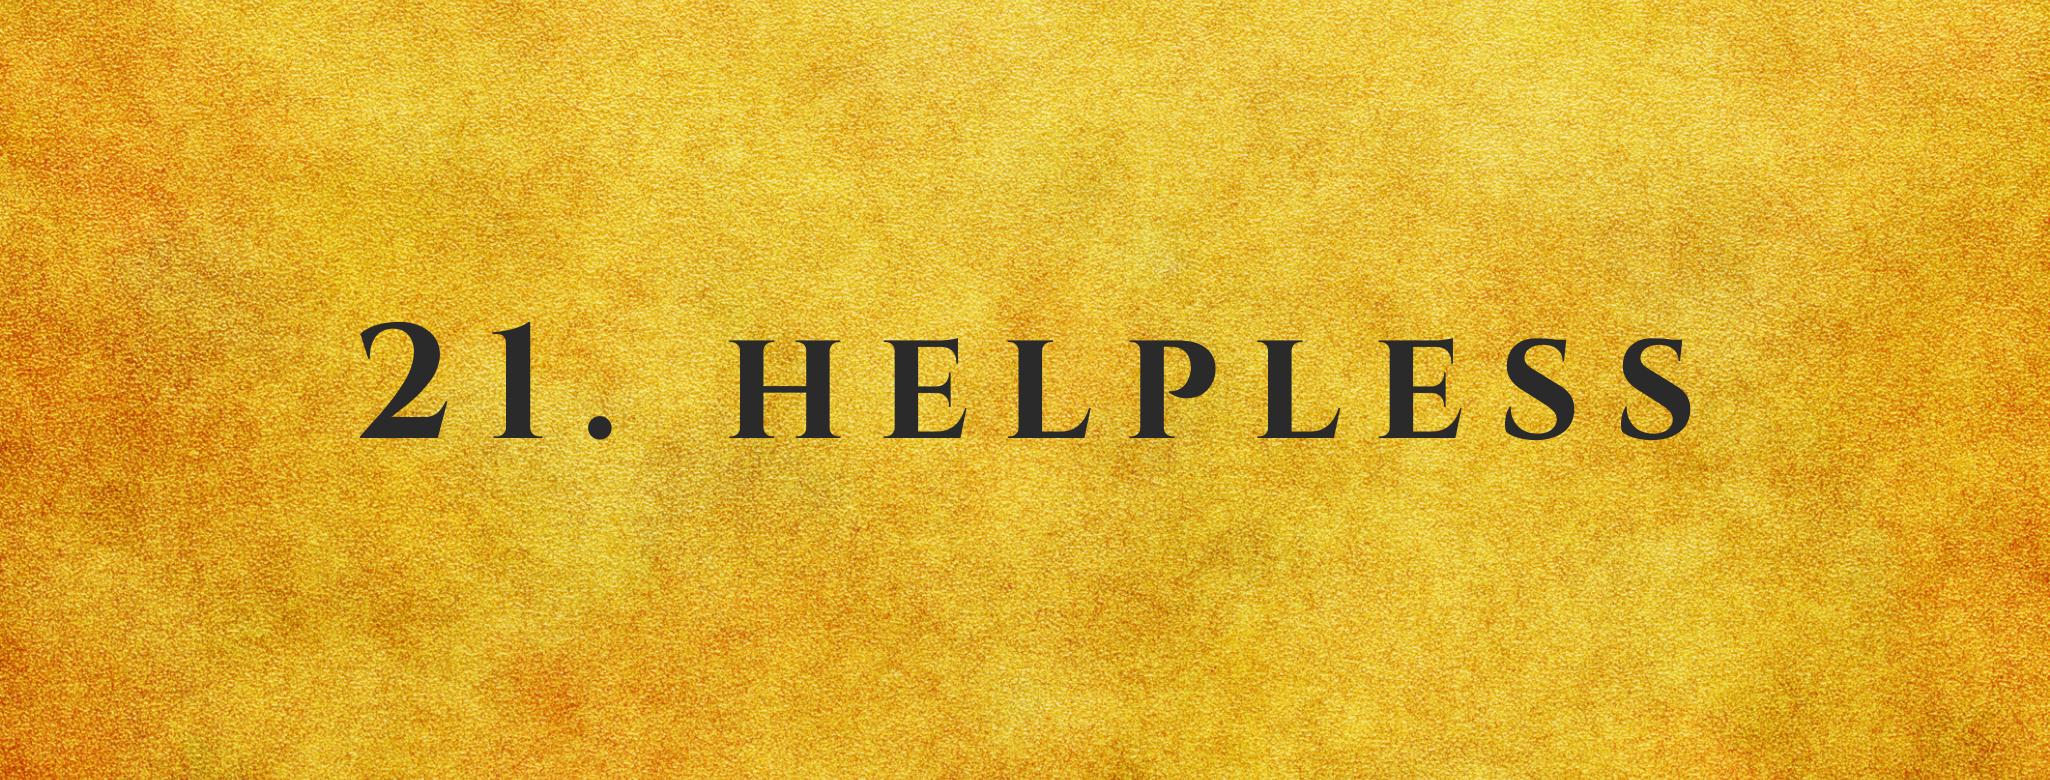 #21 Helpless